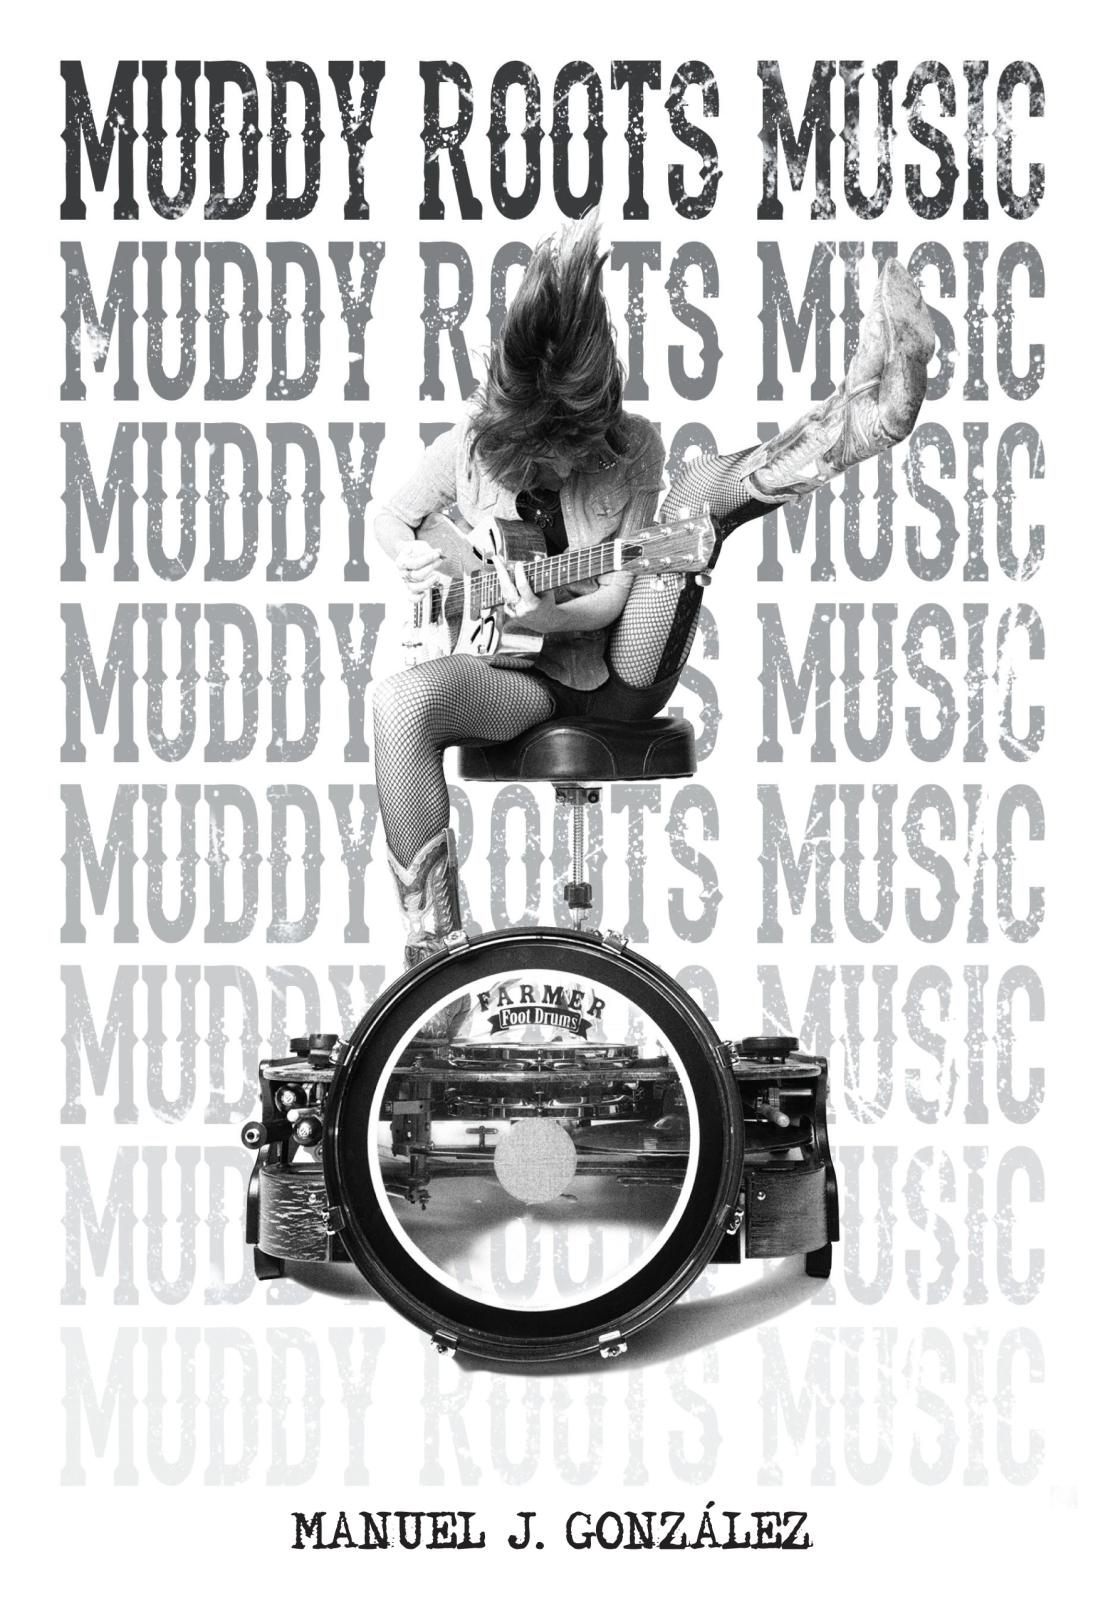 Muddy Roots Music (The Book) 2s93adj